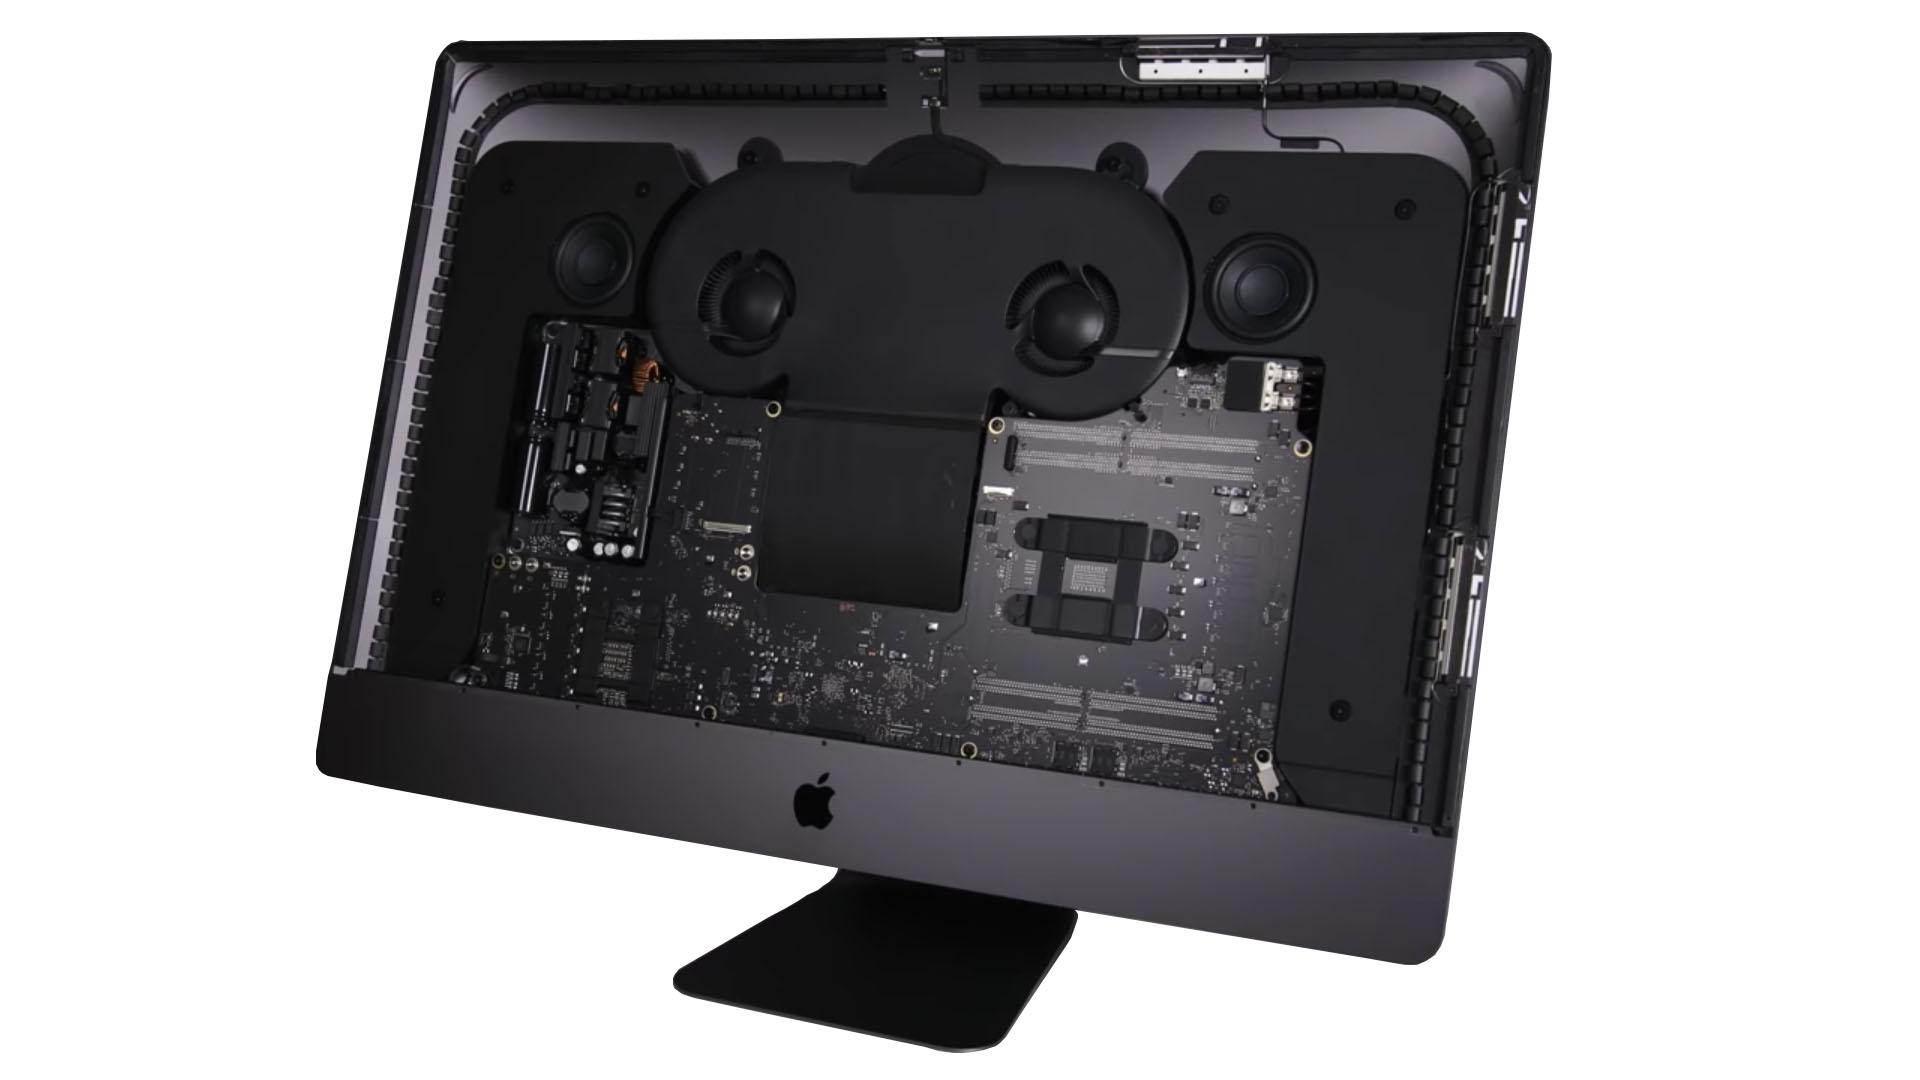 iMac Pro (late 2017) CPU & Arbeitsspeicher/RAM Upgrade/Aufrüstung | iMac (2010 - 2019) | Mac Upgrade/Aufrüstung | Tronicspot